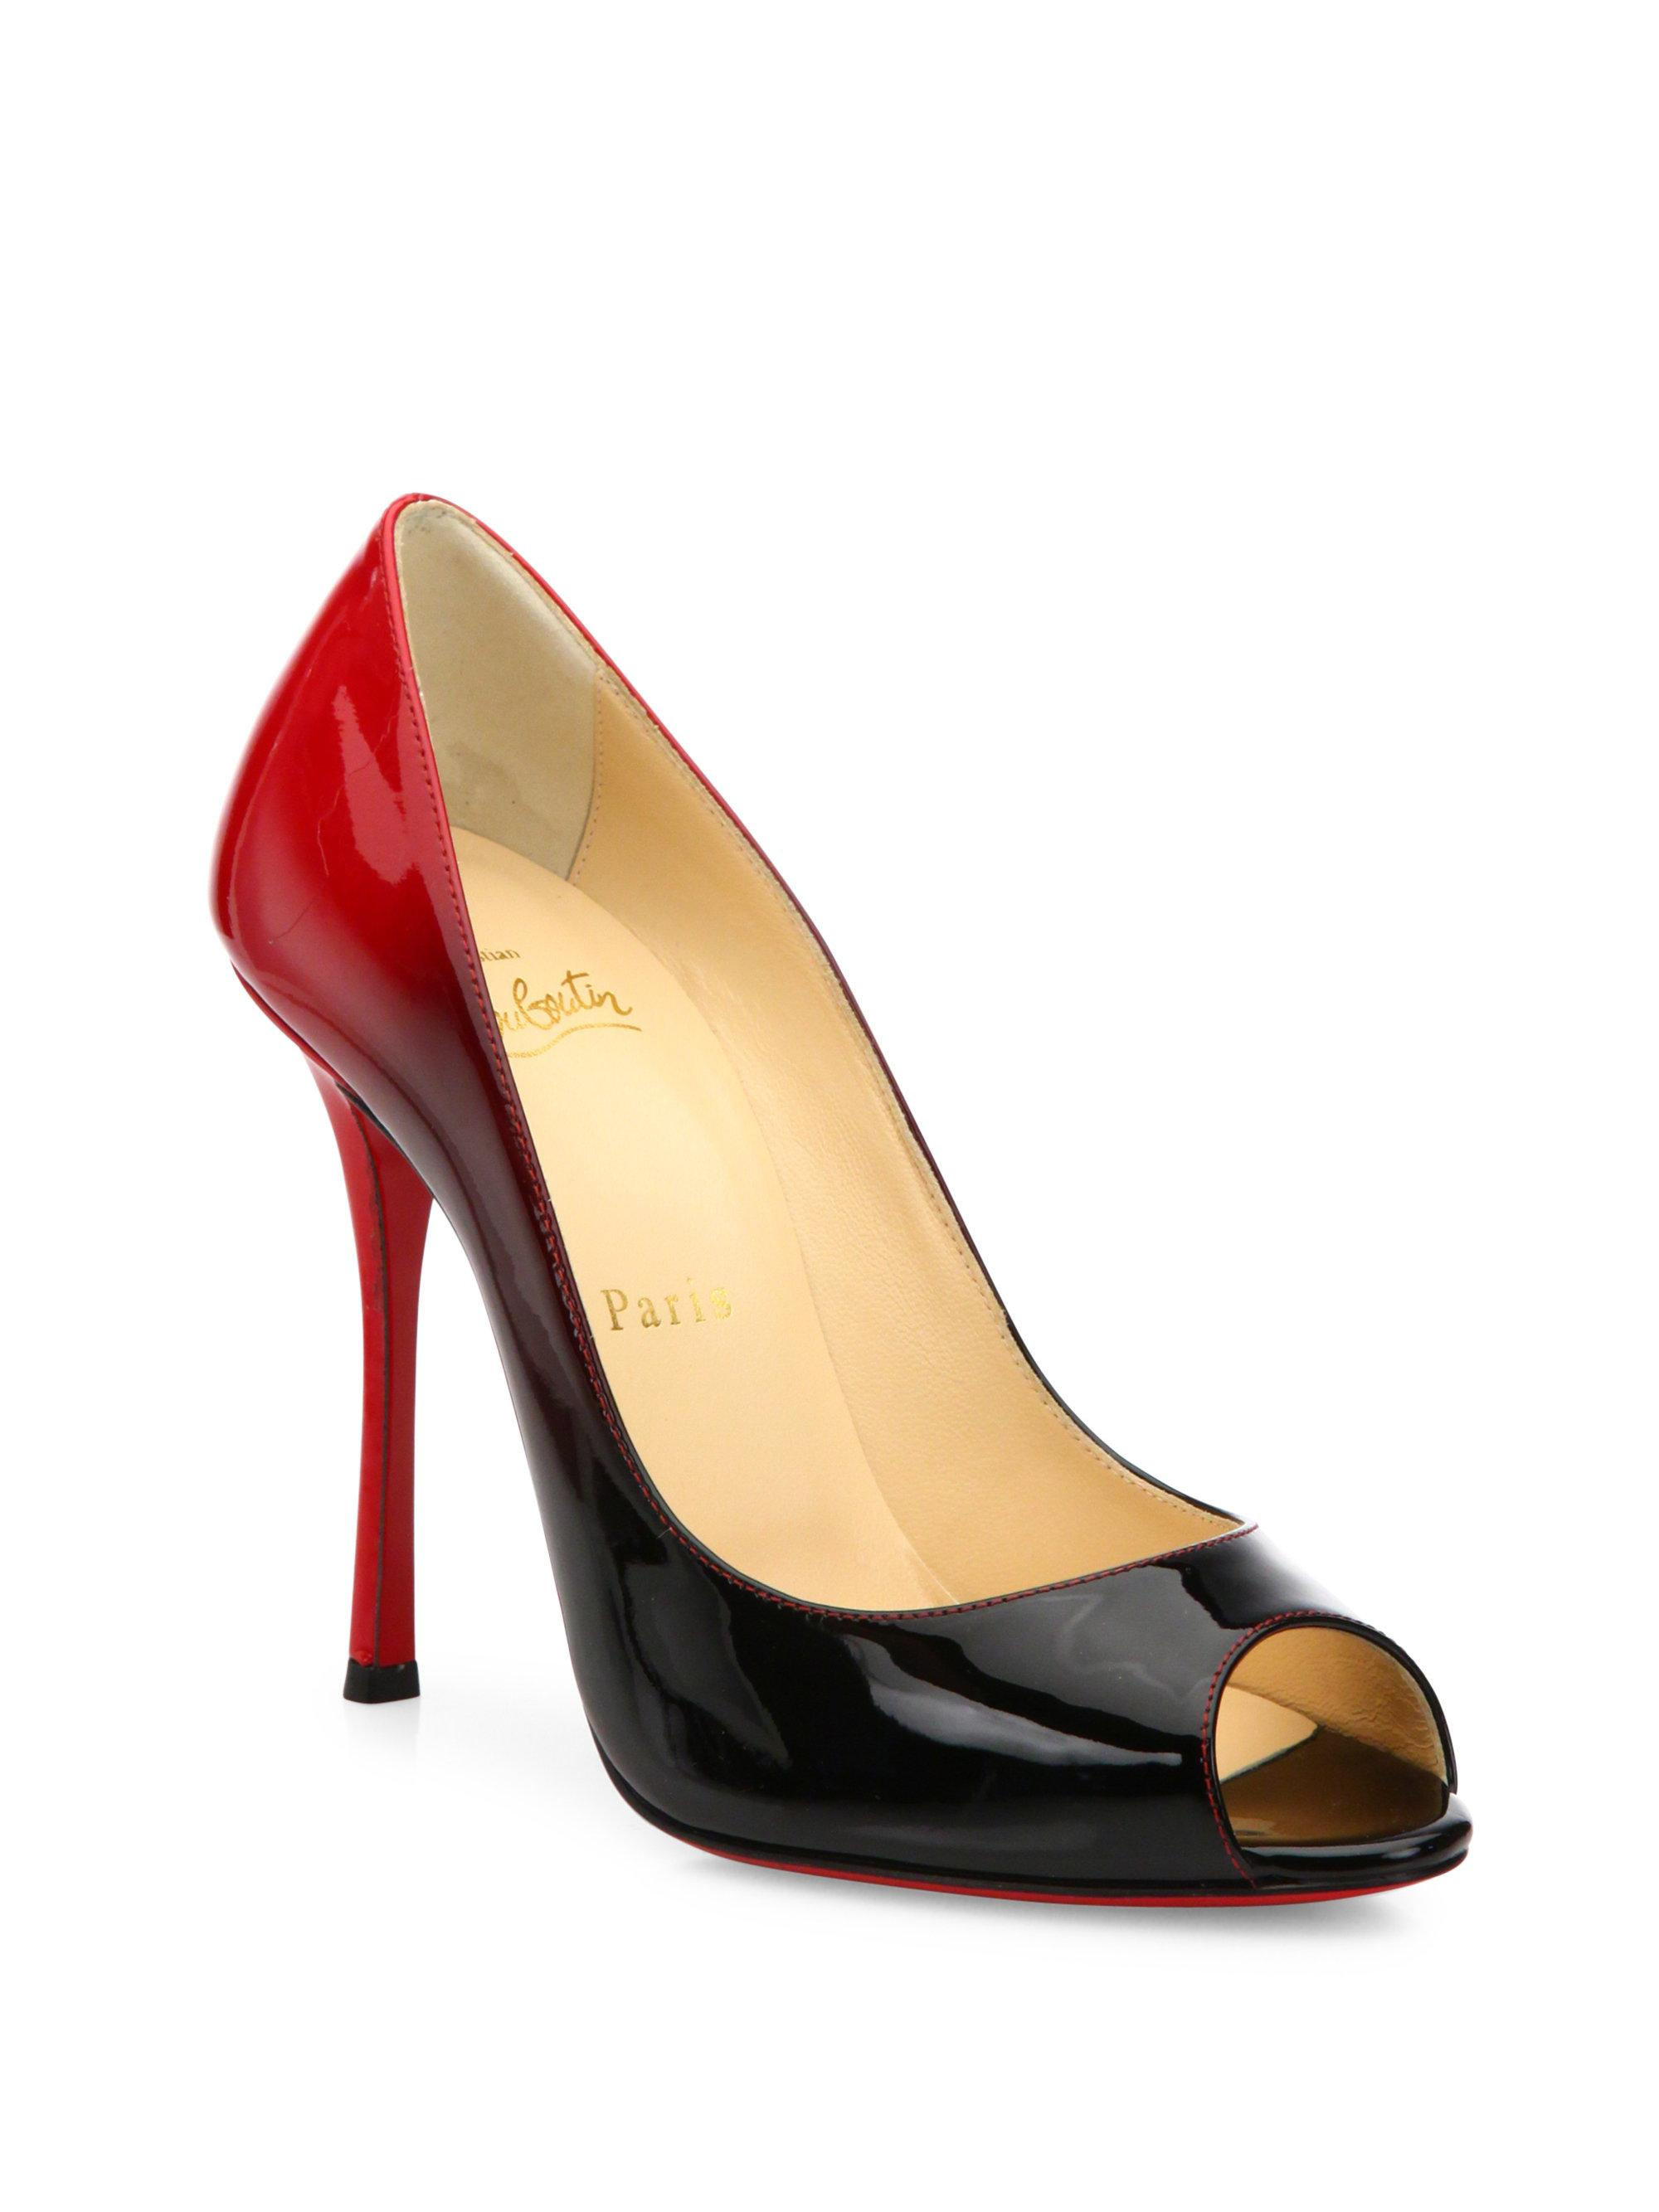 6f9814e5dc4 Christian Louboutin Black Yootish 100 Ombre Patent Leather Peep Toe Pumps